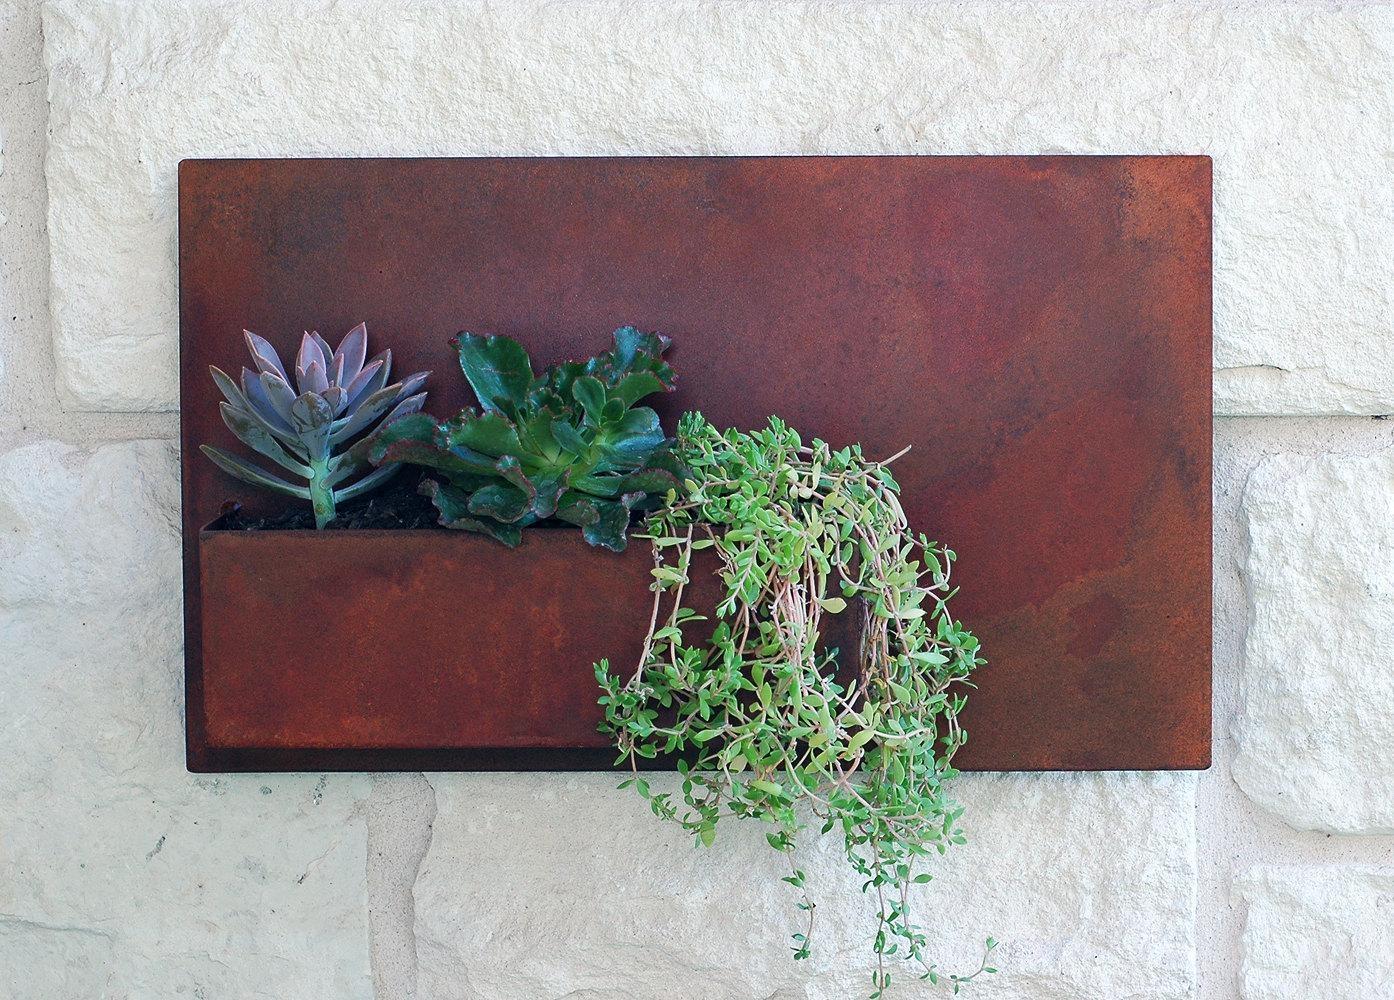 Decor : 92 Interesting Outdoors Wall Art Ideas Metal Wall Art For Regarding Modern Outdoor Wall Art (Image 14 of 20)